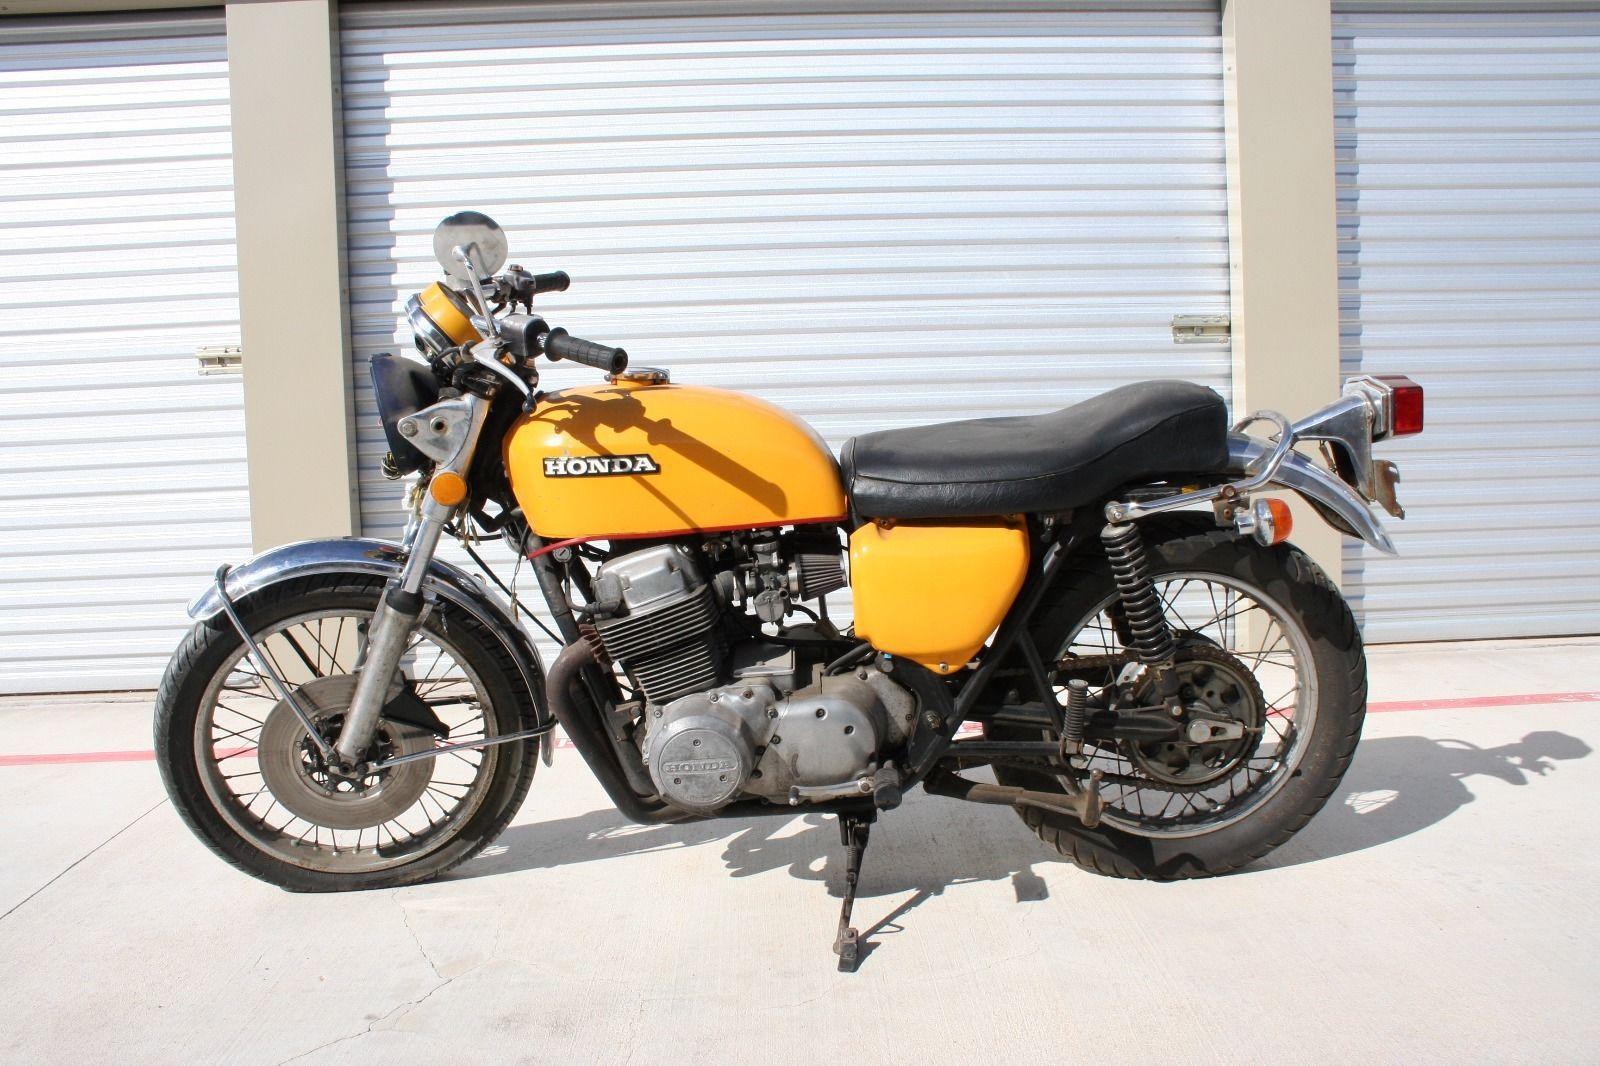 1975 Honda Cb750 Cafe Racer Conversion For Sale